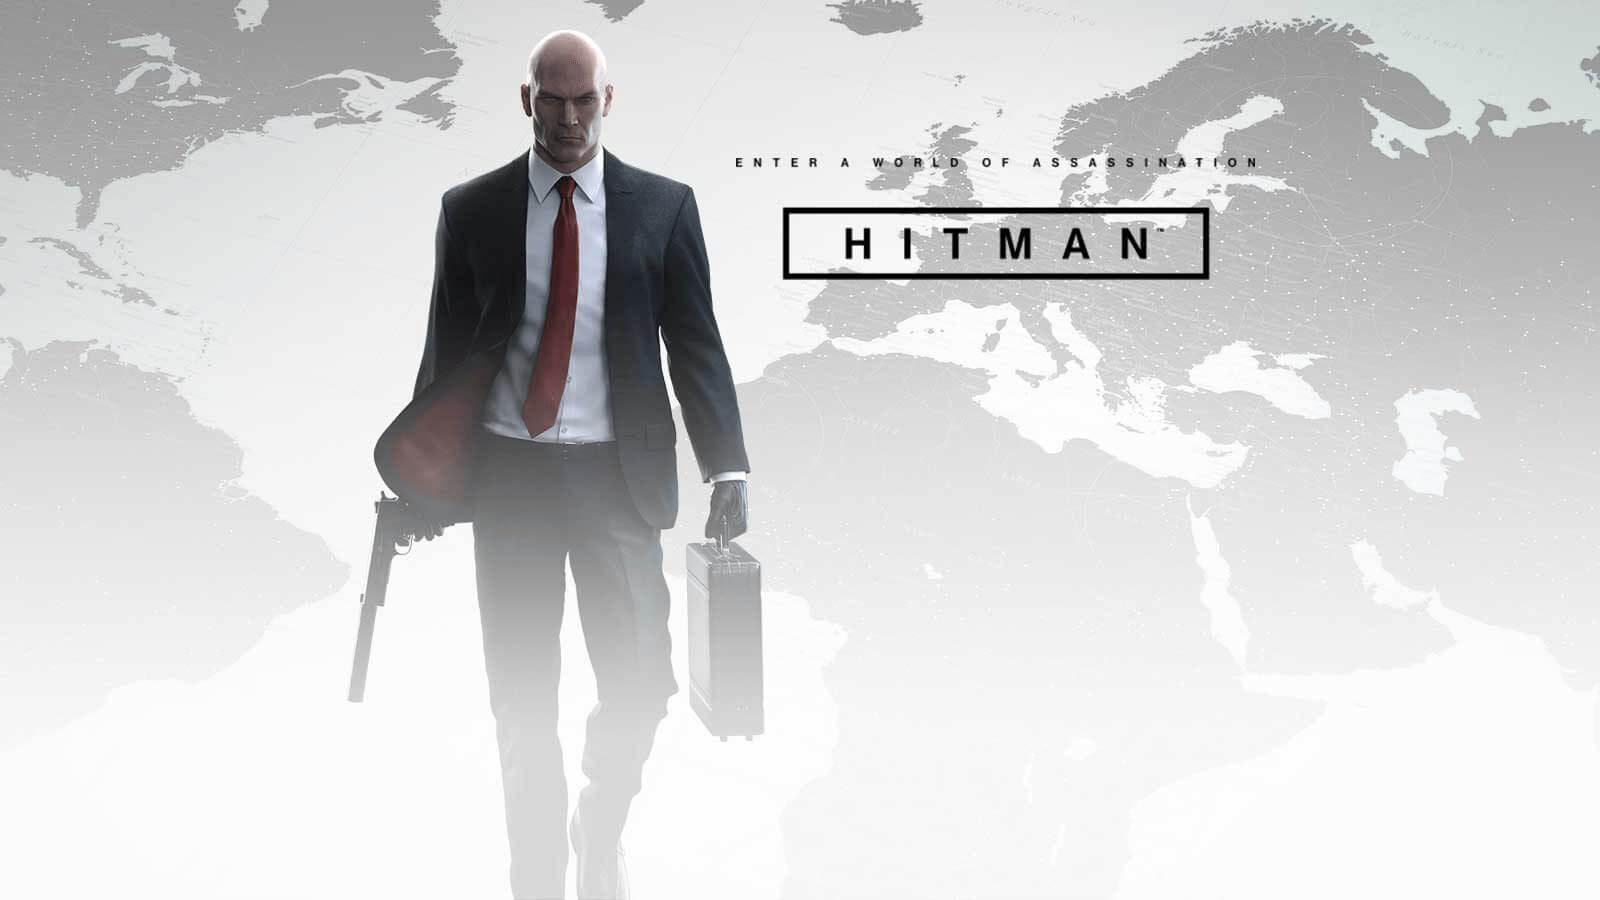 Game Review: Hitman - Episódio 1: Paris